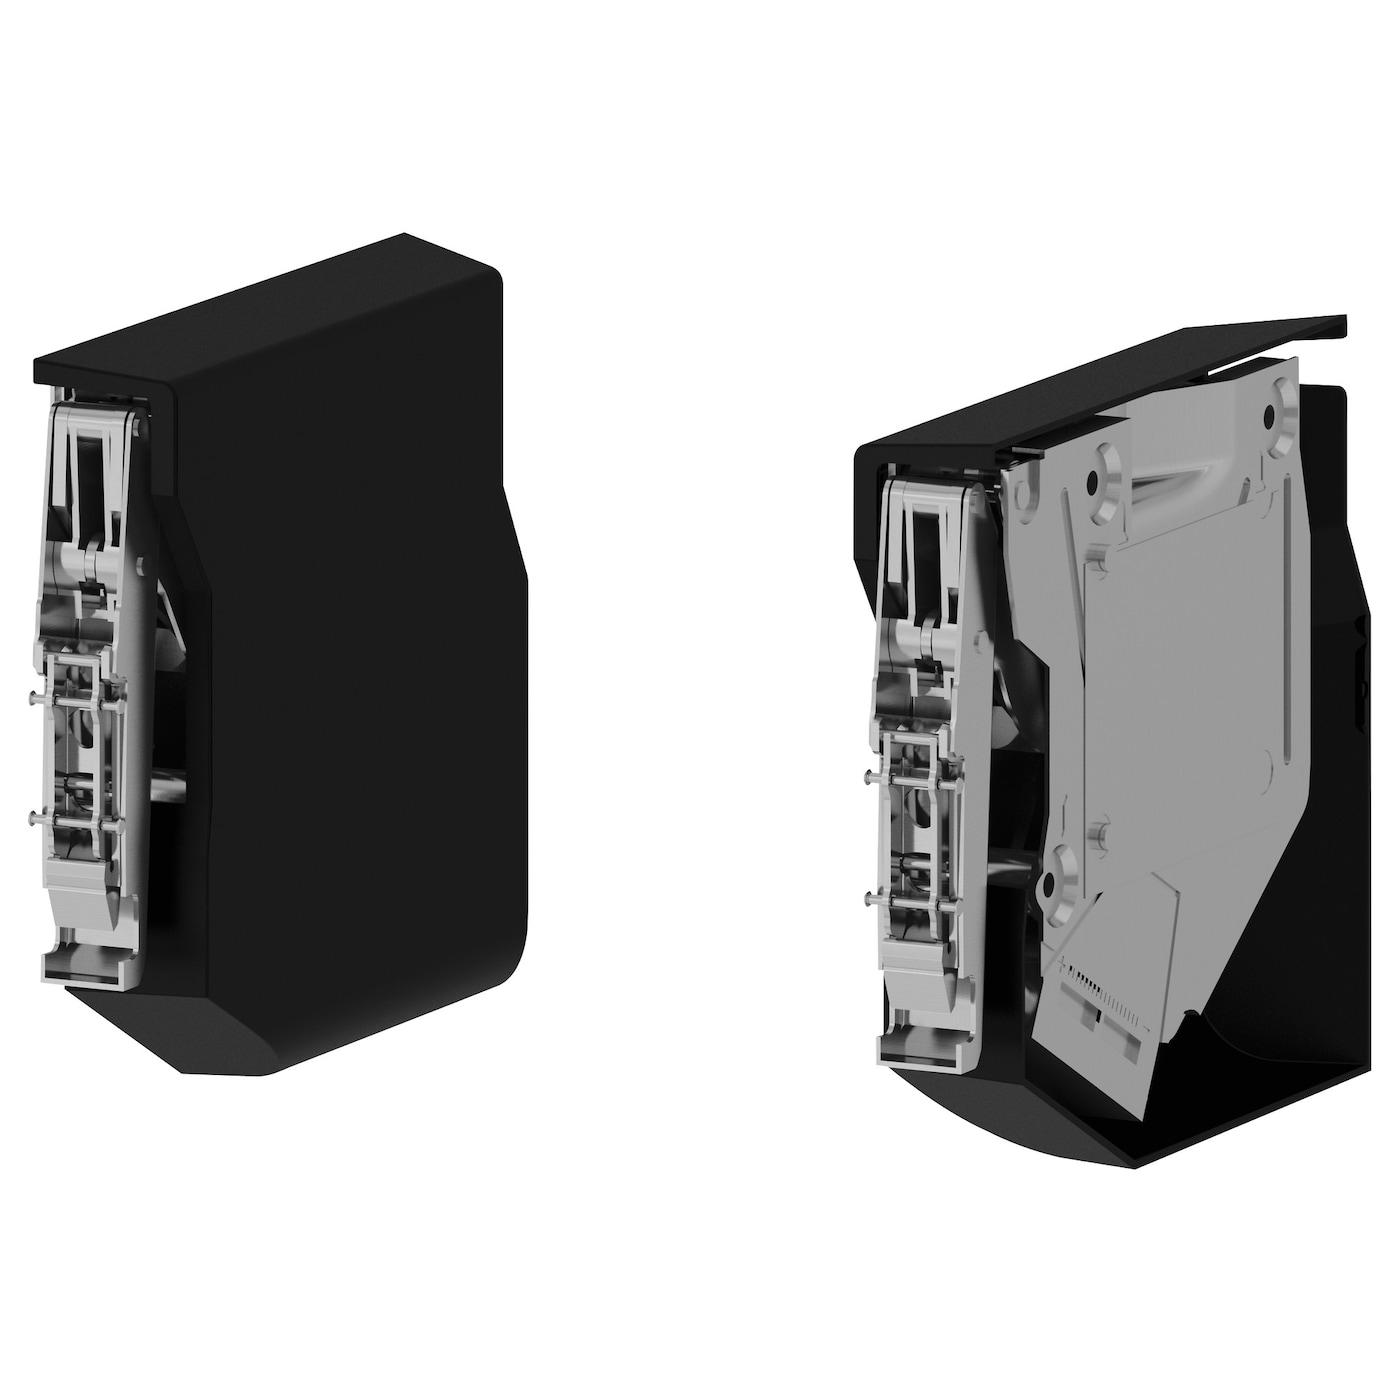 utrusta small hinge for horizontal door black ikea. Black Bedroom Furniture Sets. Home Design Ideas